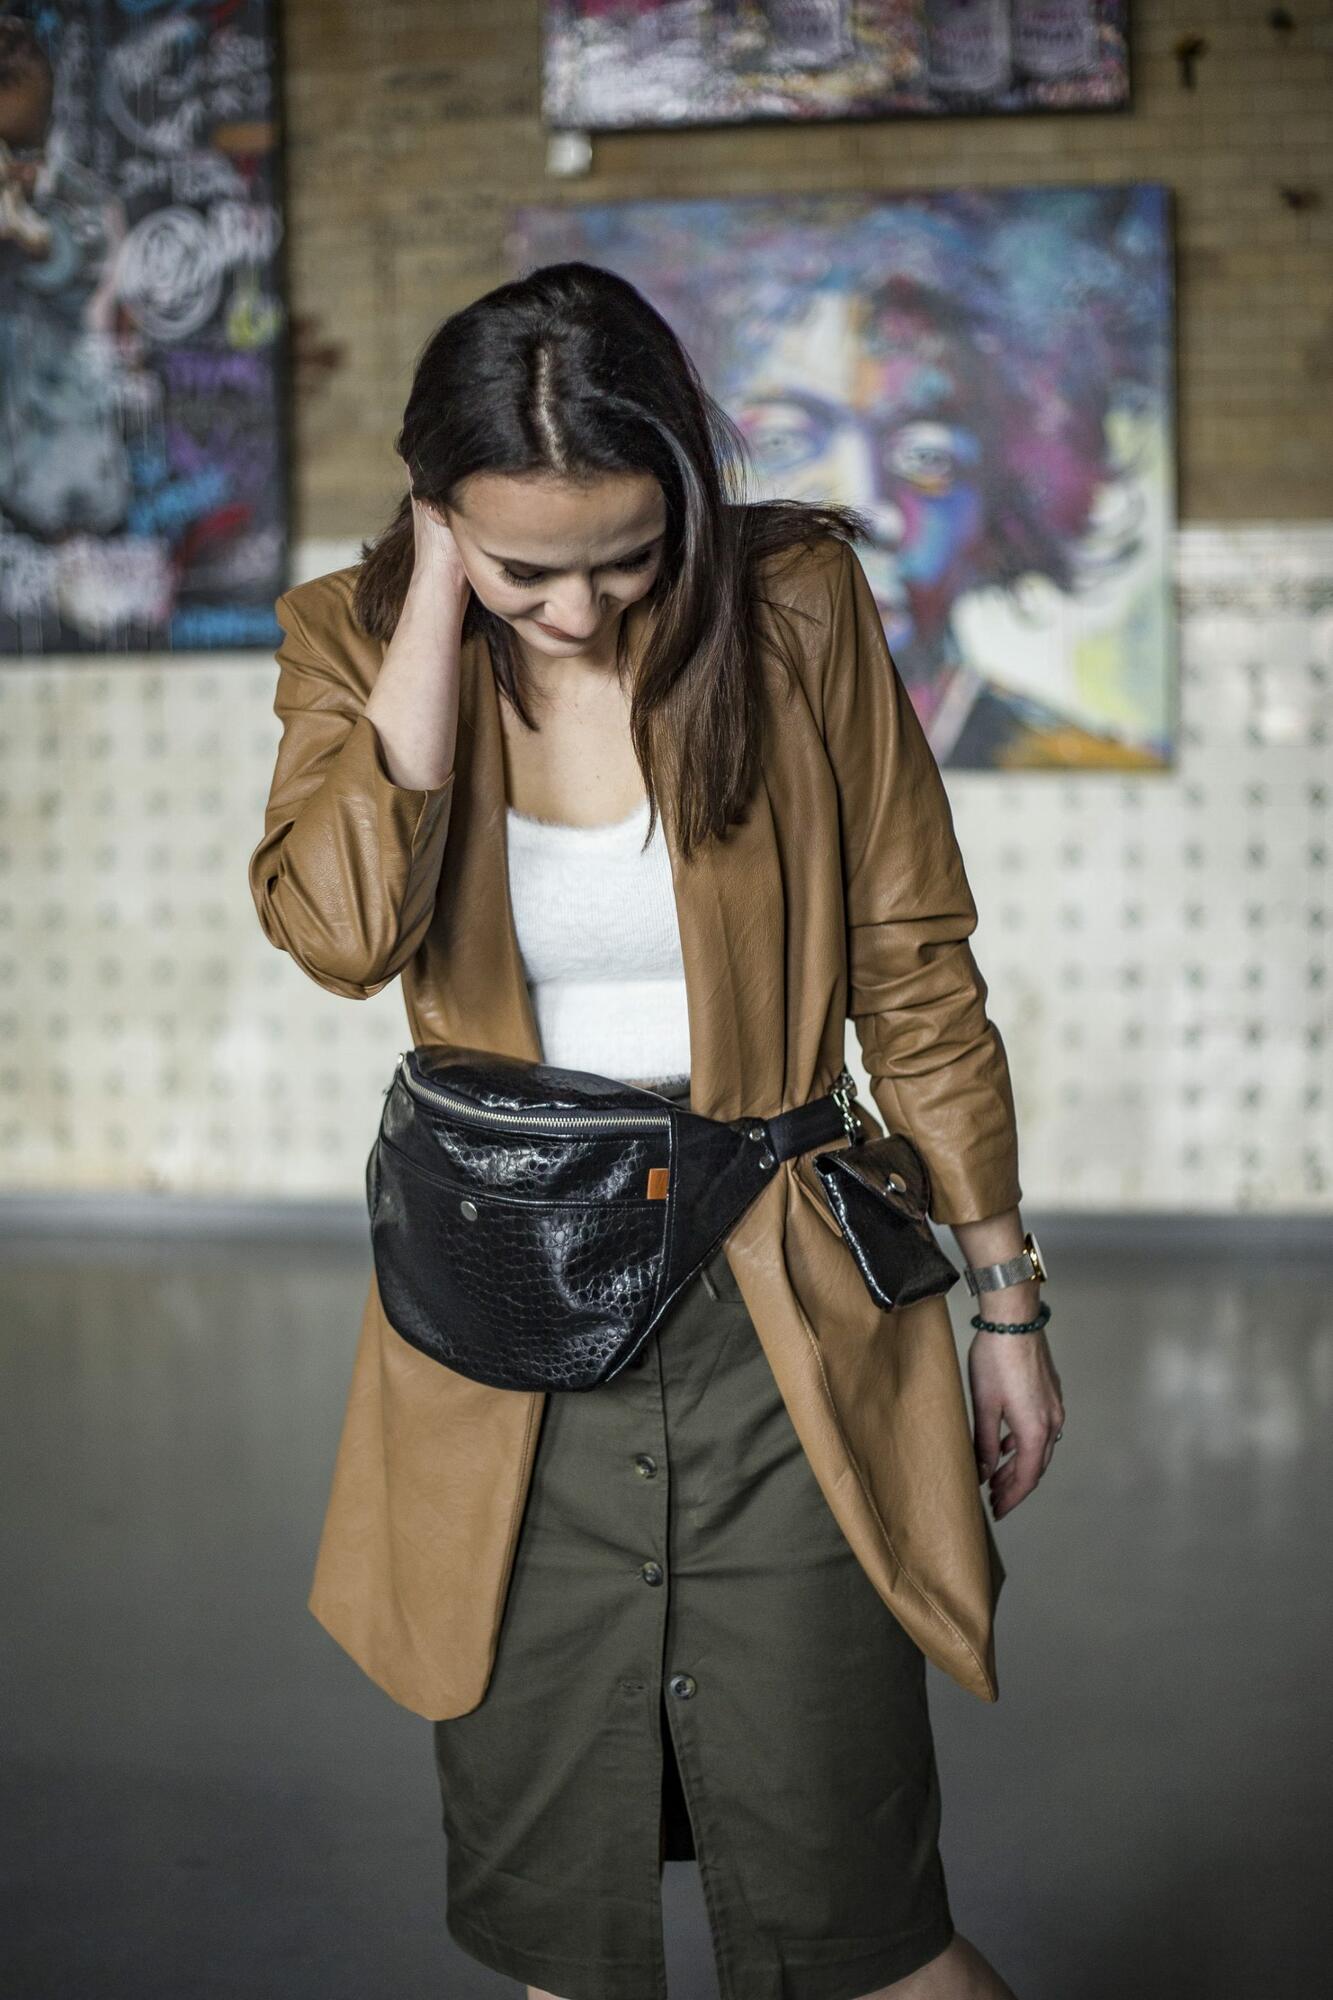 Nerka Black CrocoGlam z saszetką - Tasiemasie | JestemSlow.pl